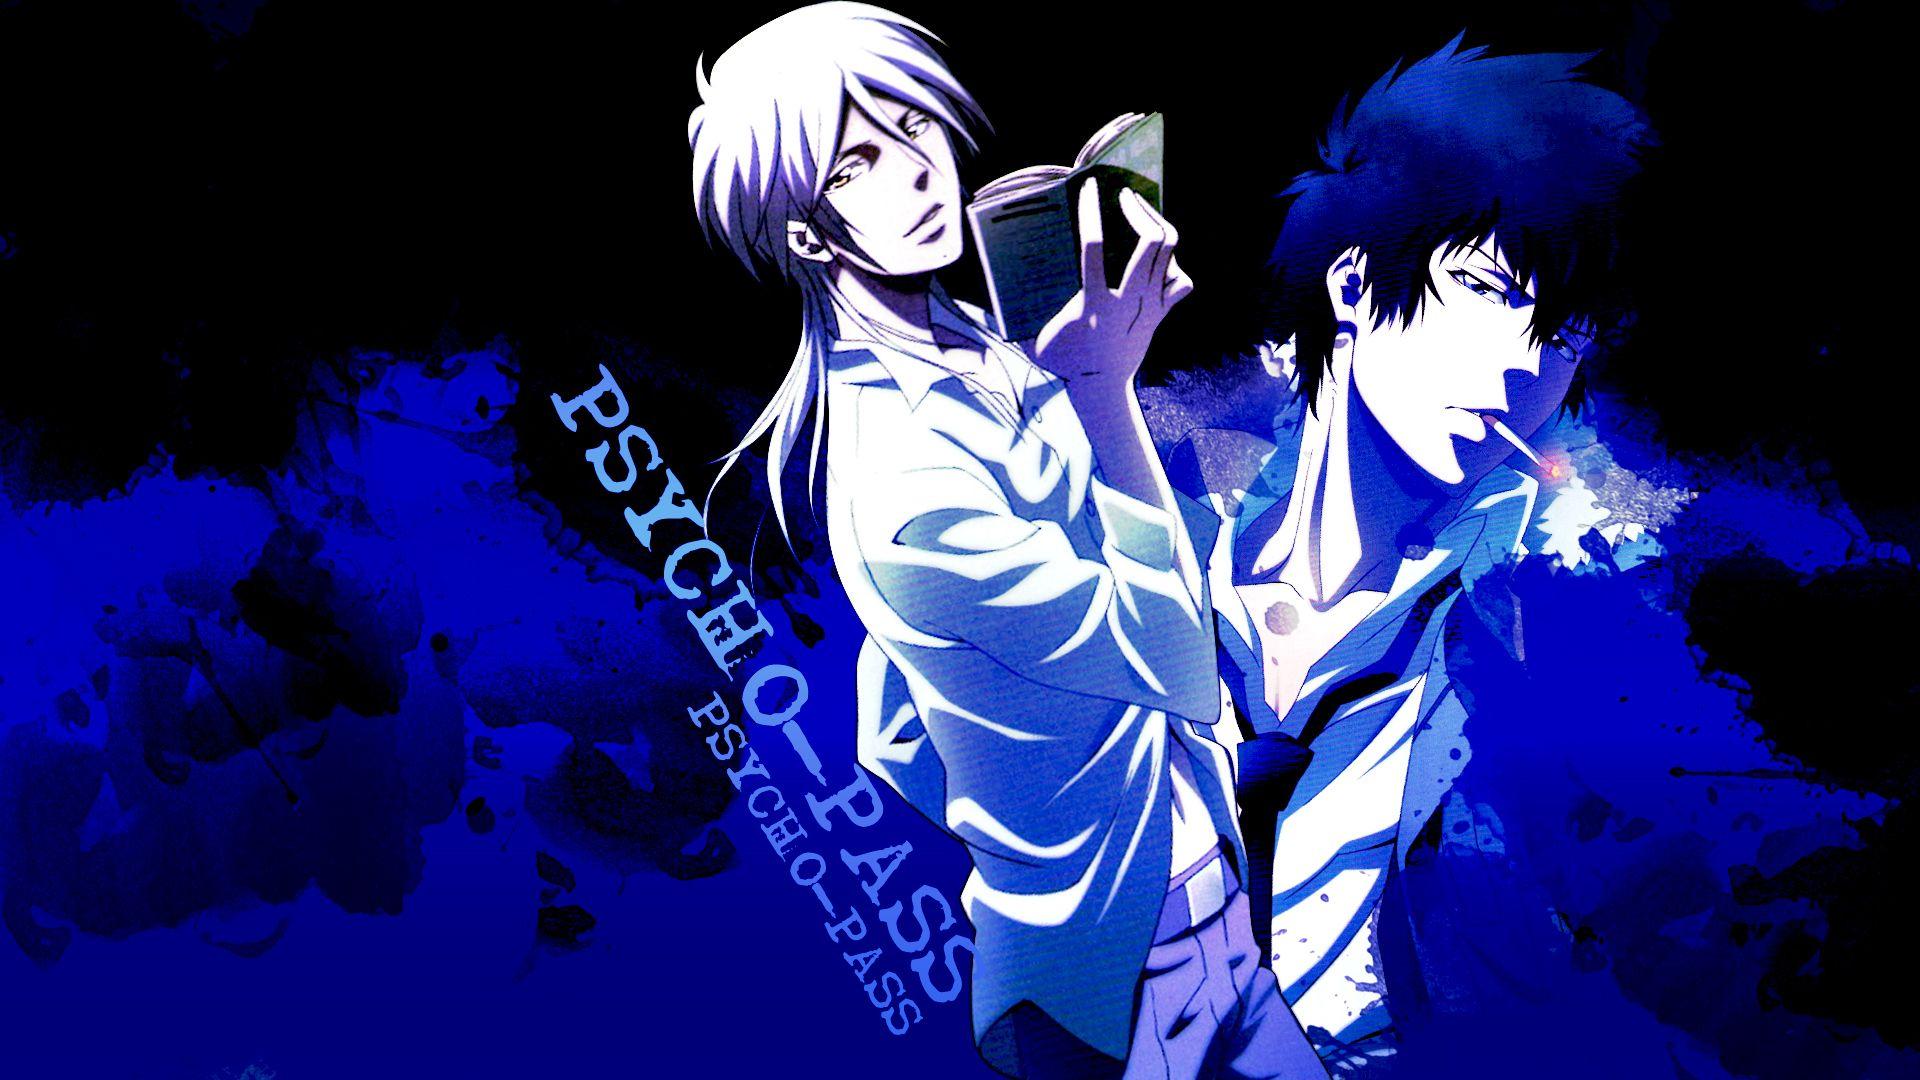 Makishima and Kougami Psycho Pass Wallpaper Psycho pass